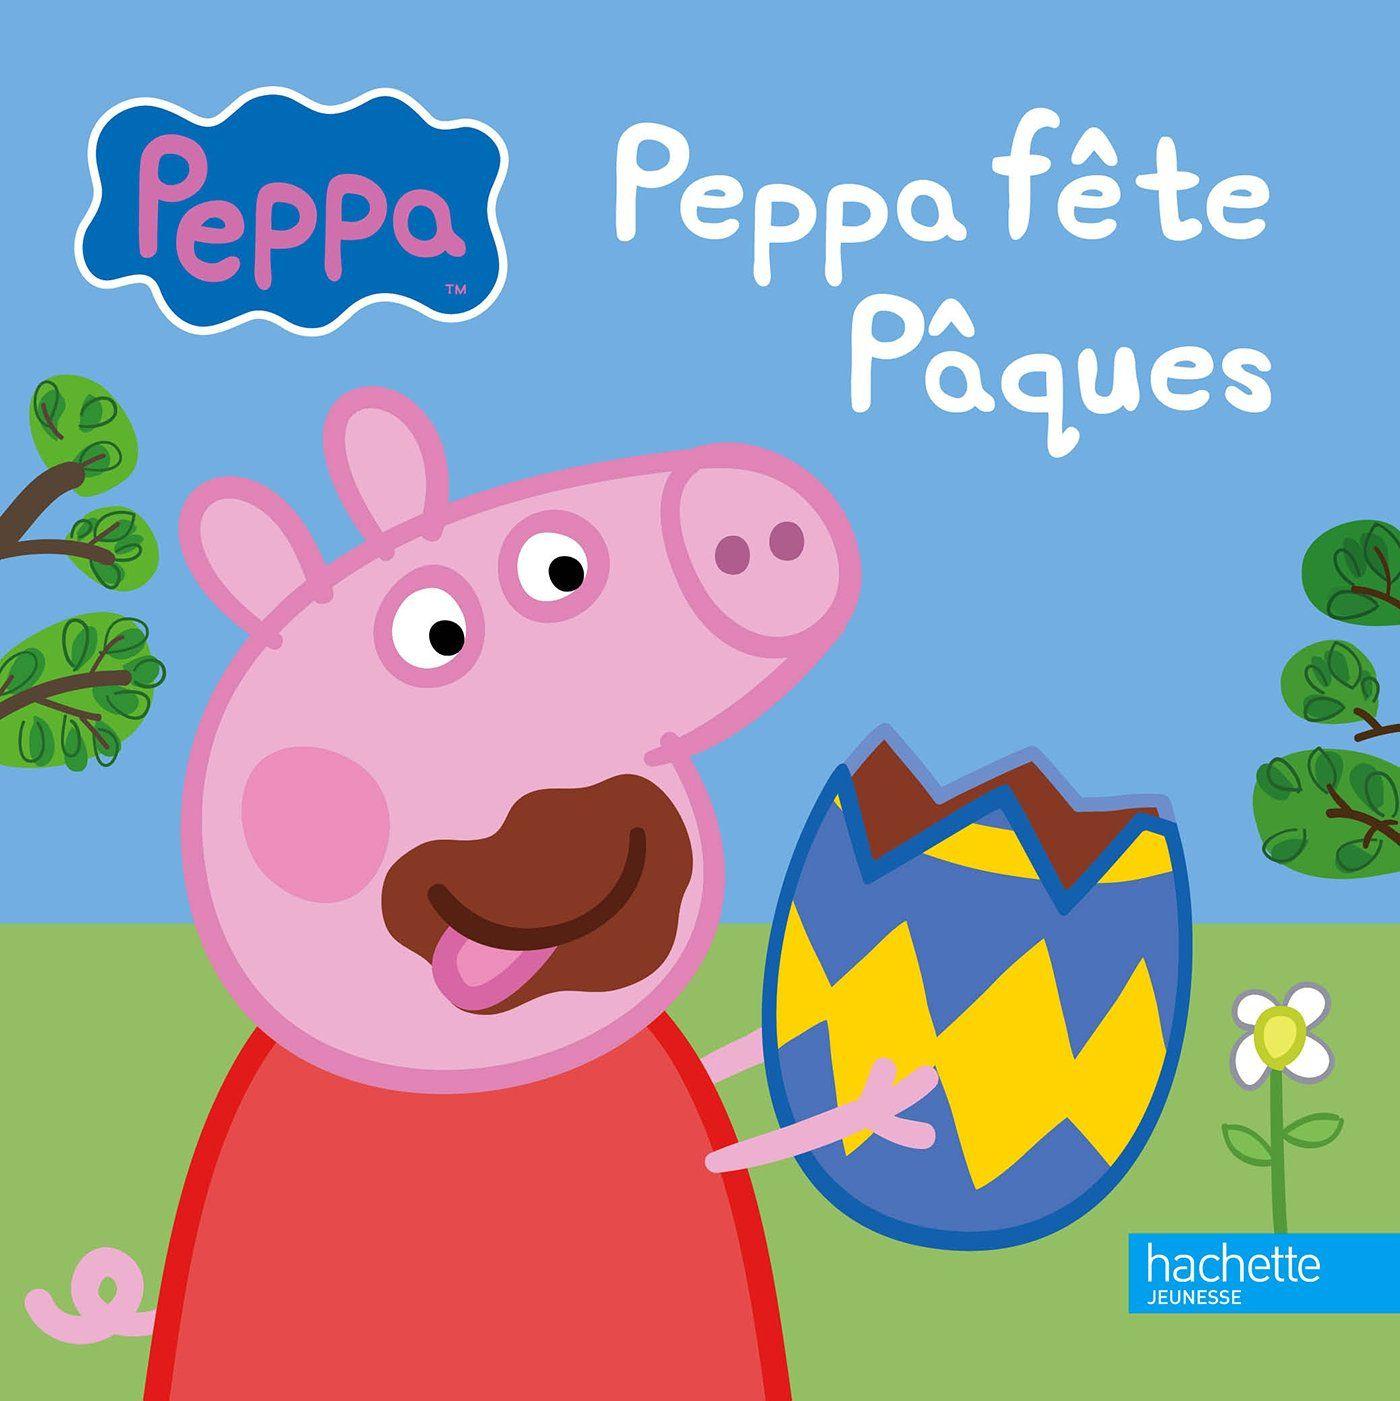 Peppa Pig fête Pâques